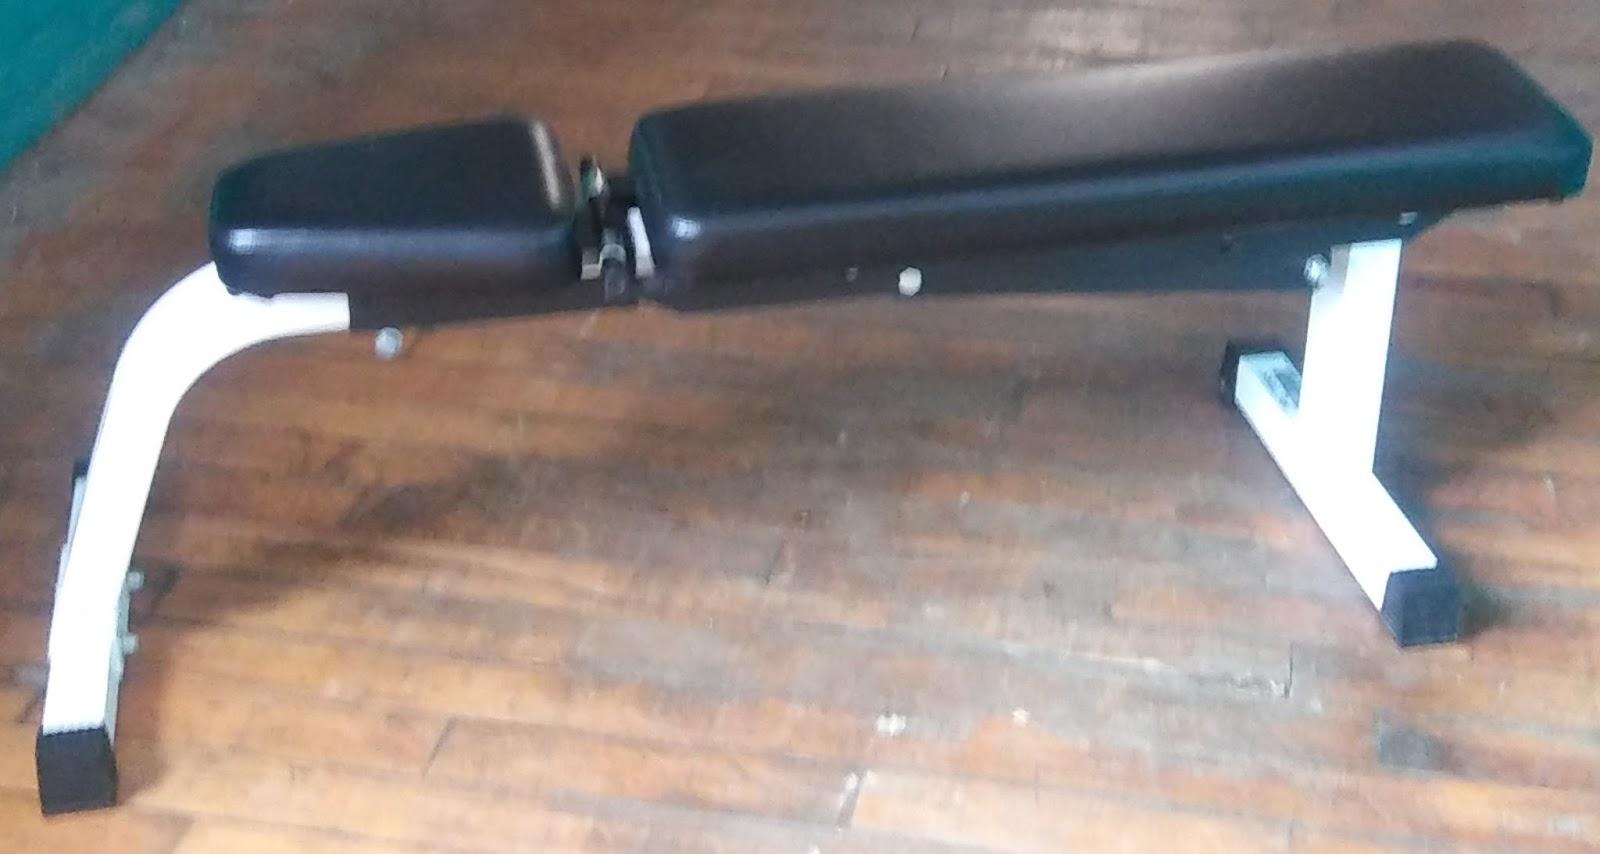 Attractive ParaBody Heavy Duty Flat/Incline Bench